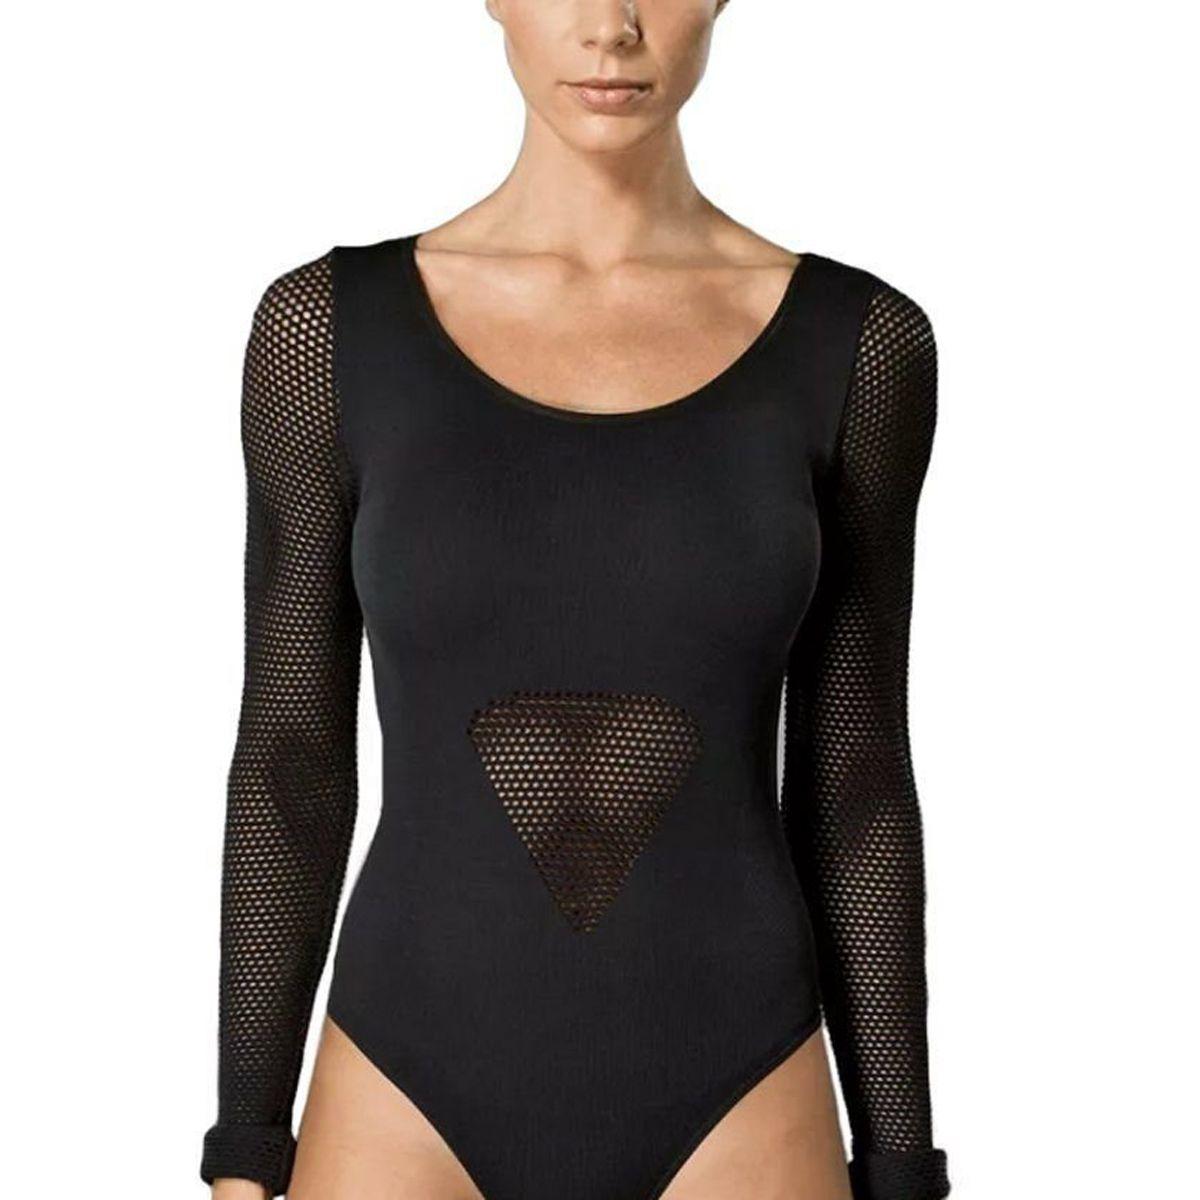 Body feminino modelo arrastão manga longa para academia Lupo 71643 .